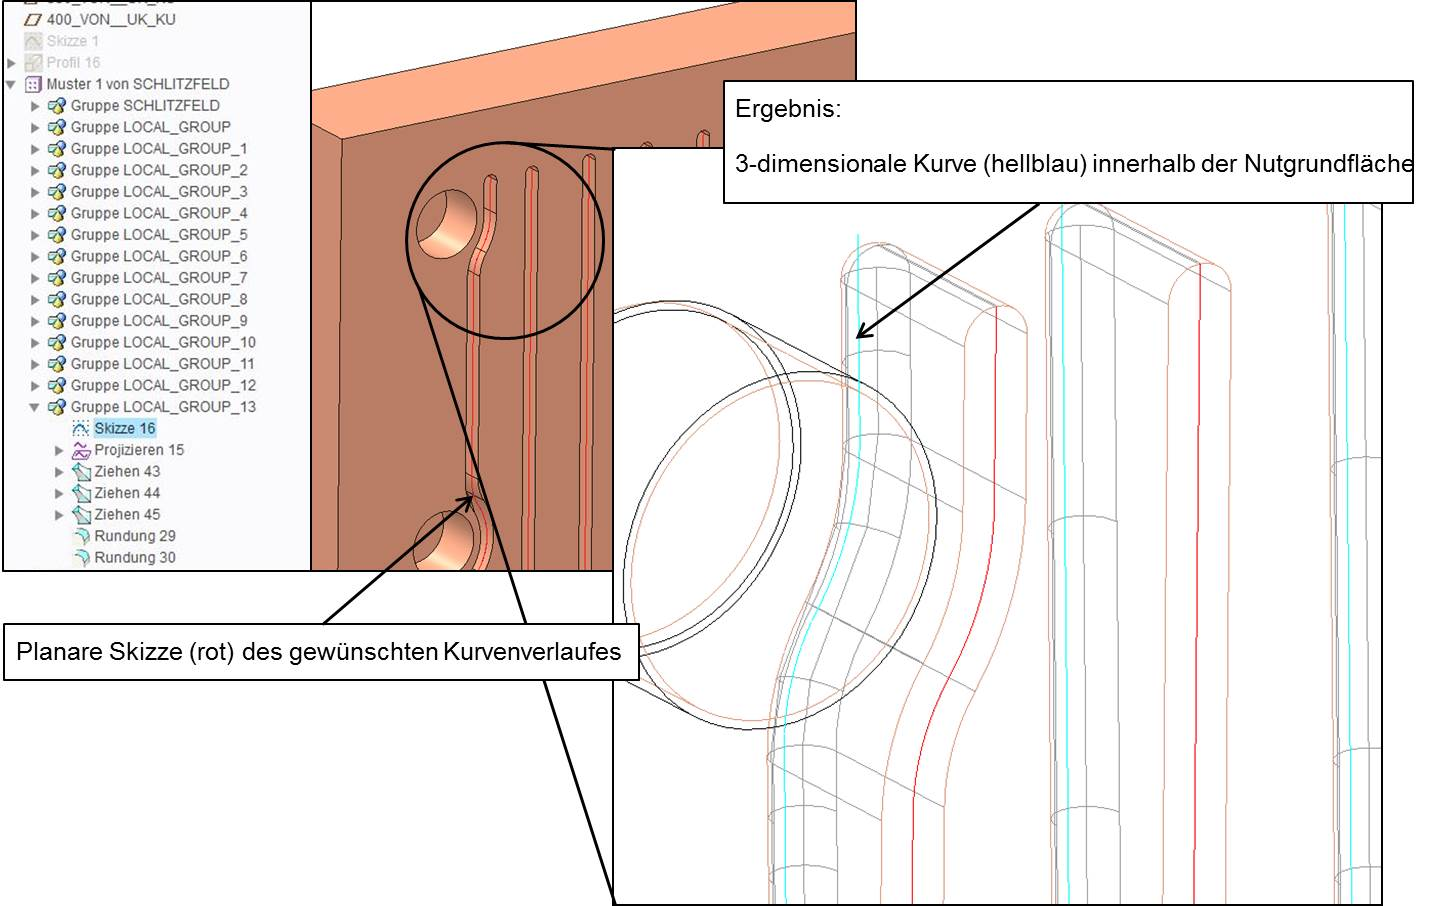 Bild 7: Nutverläufe und Projektion. (Bild: SMS Siemag)